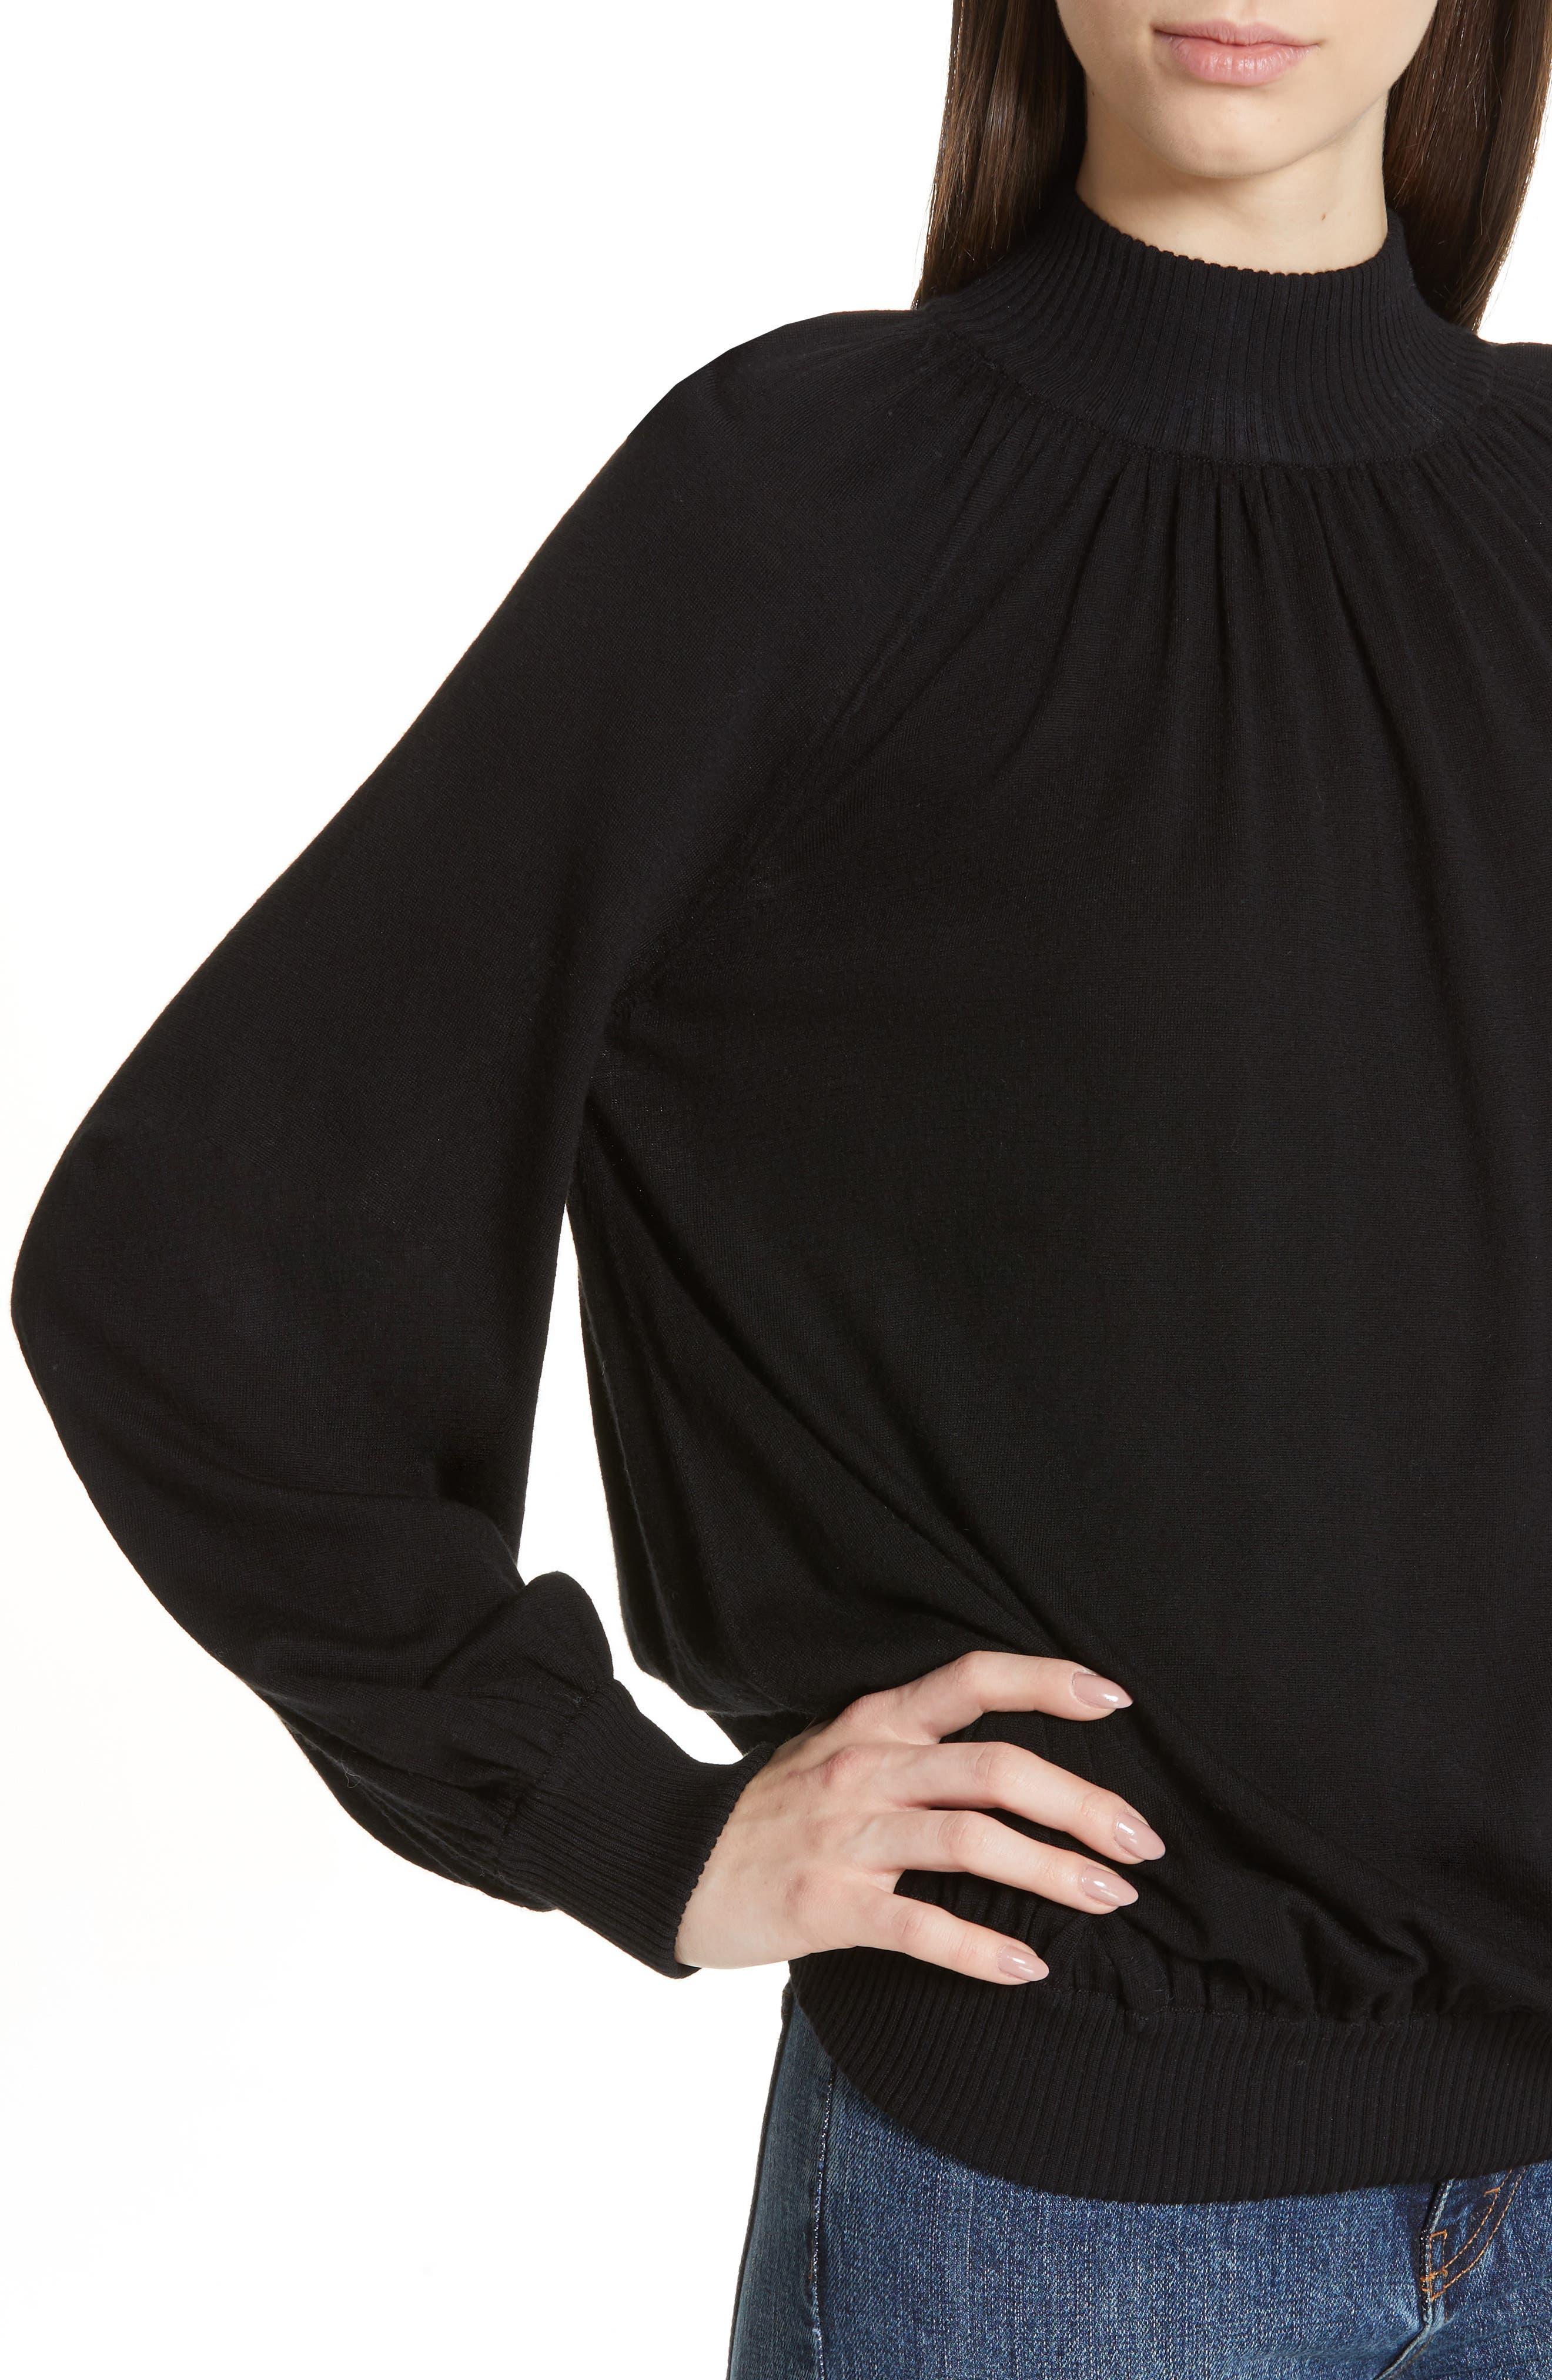 CO, Cashmere High Neck Blouson Sweater, Alternate thumbnail 4, color, BLACK